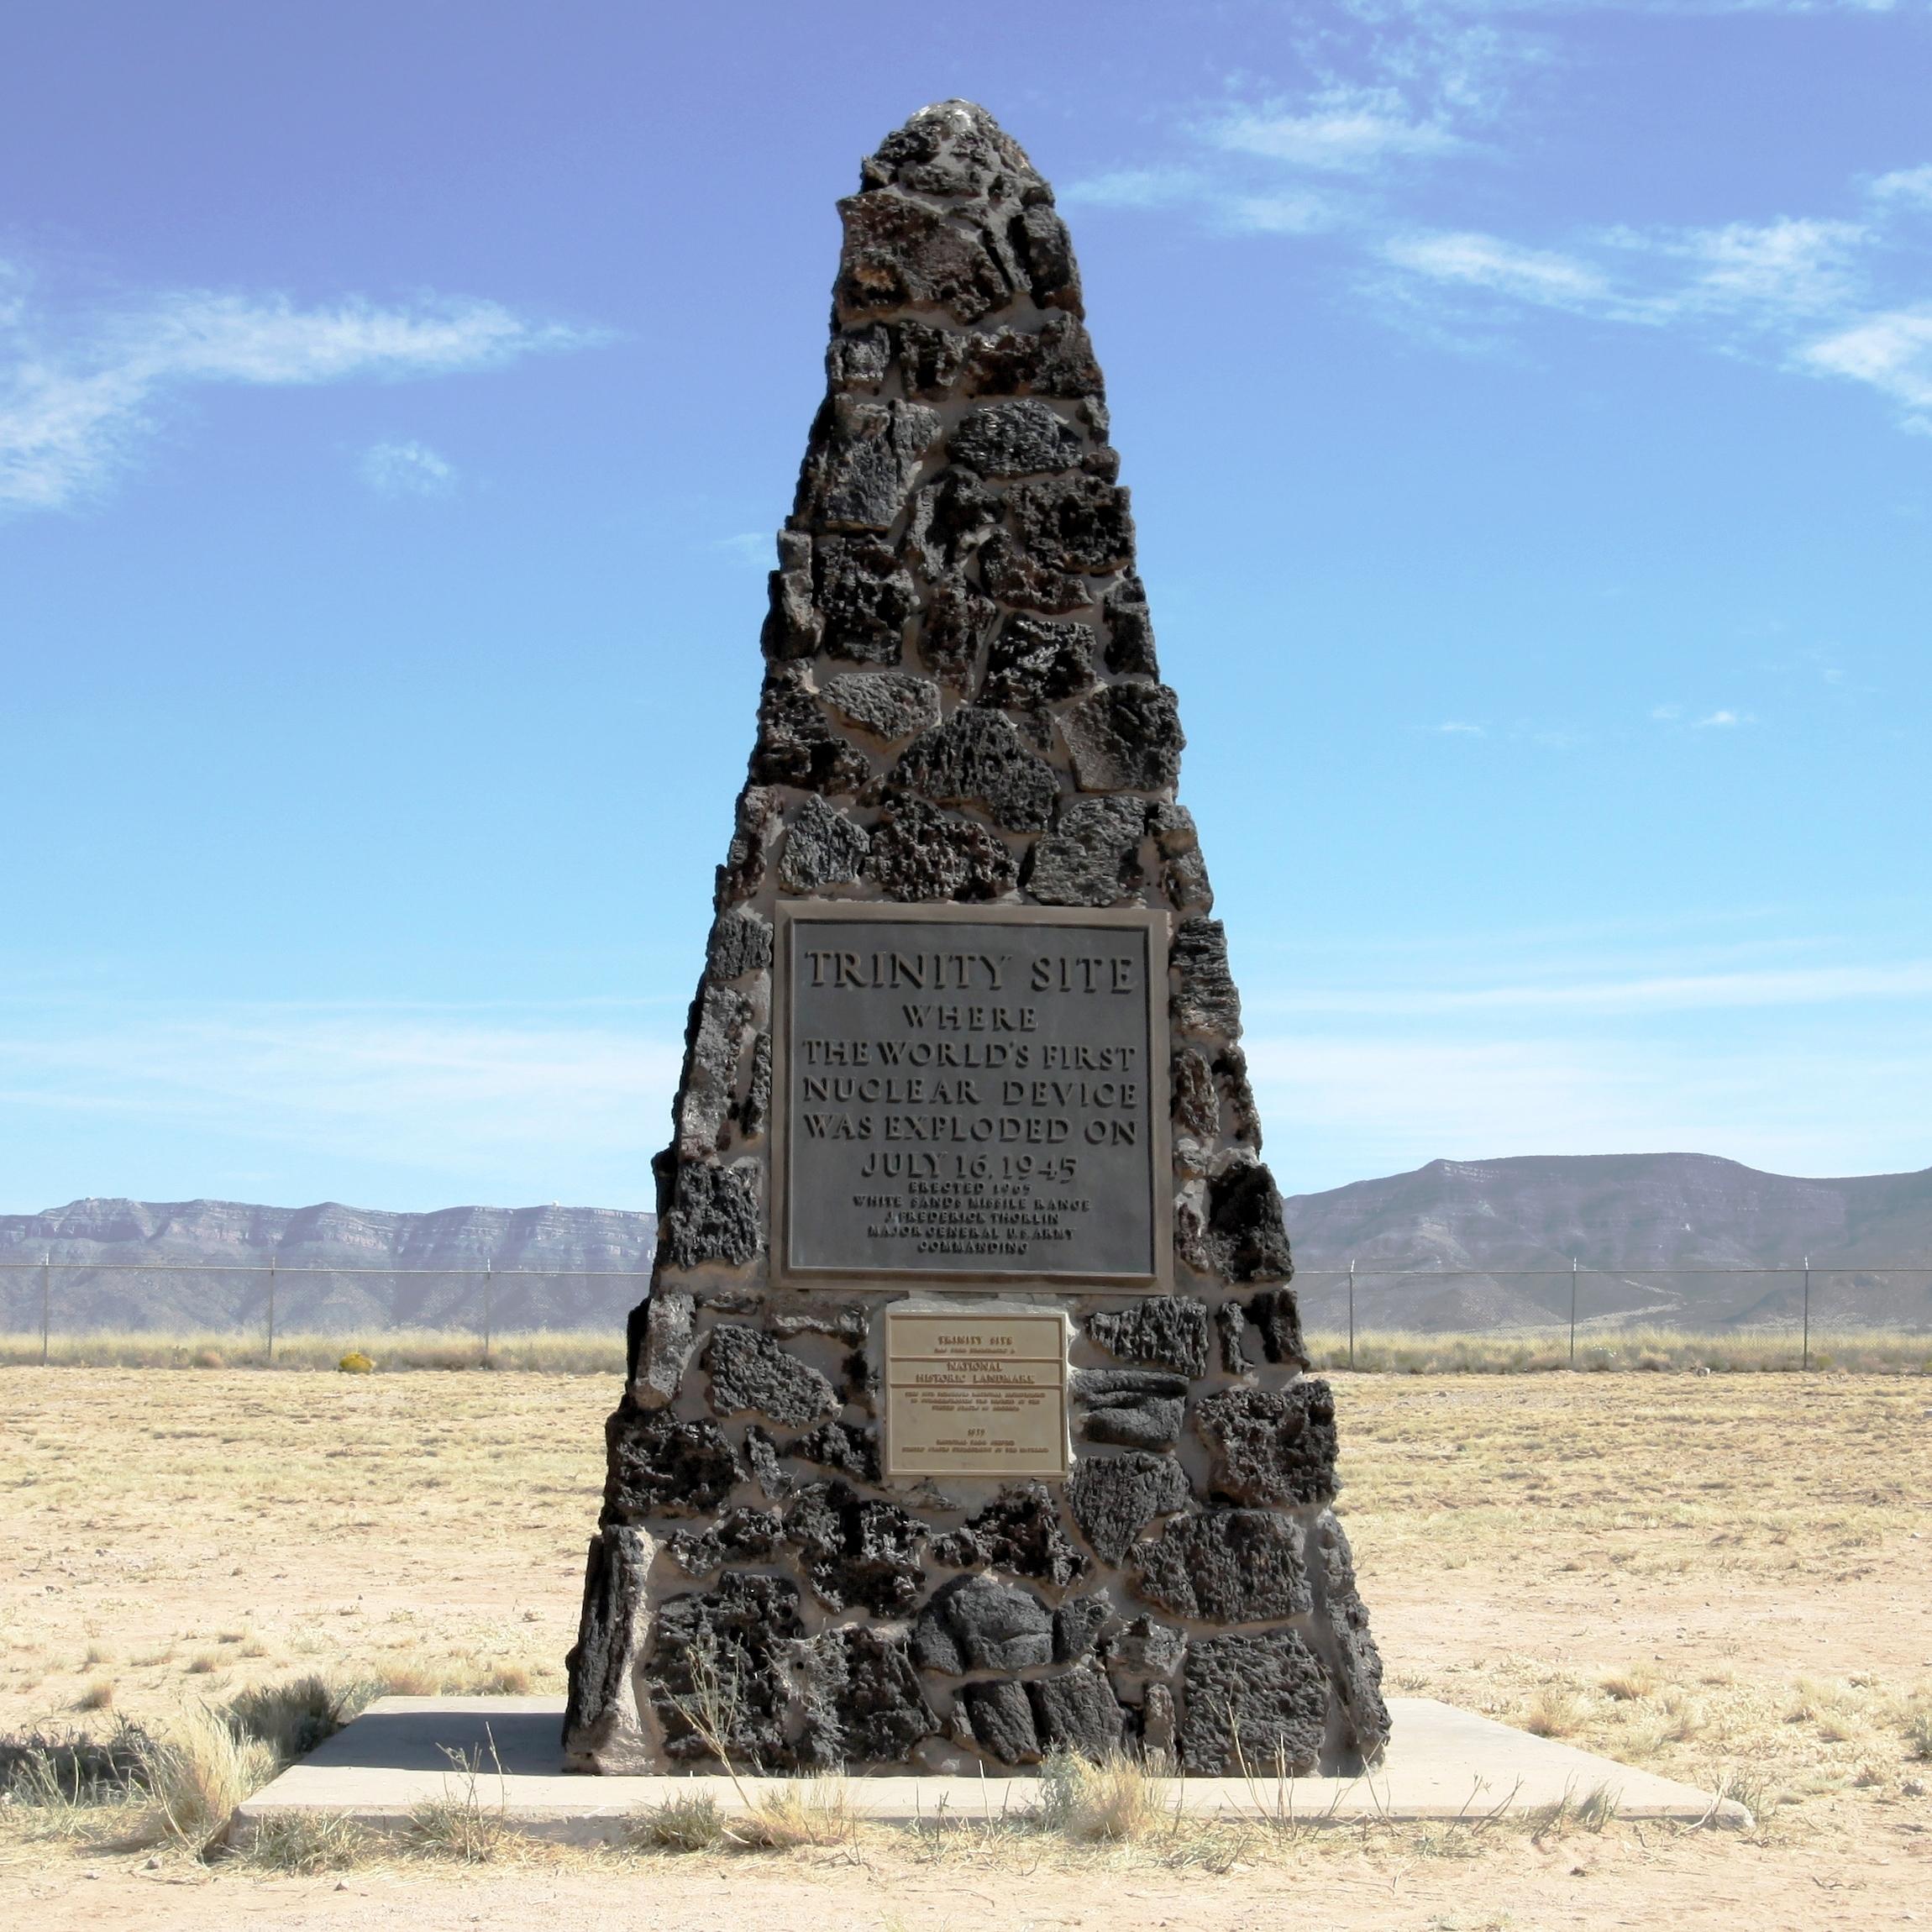 2ba411f8996648519de3_Trinity_Site_Obelisk_National_Historic_Landmark.jpg